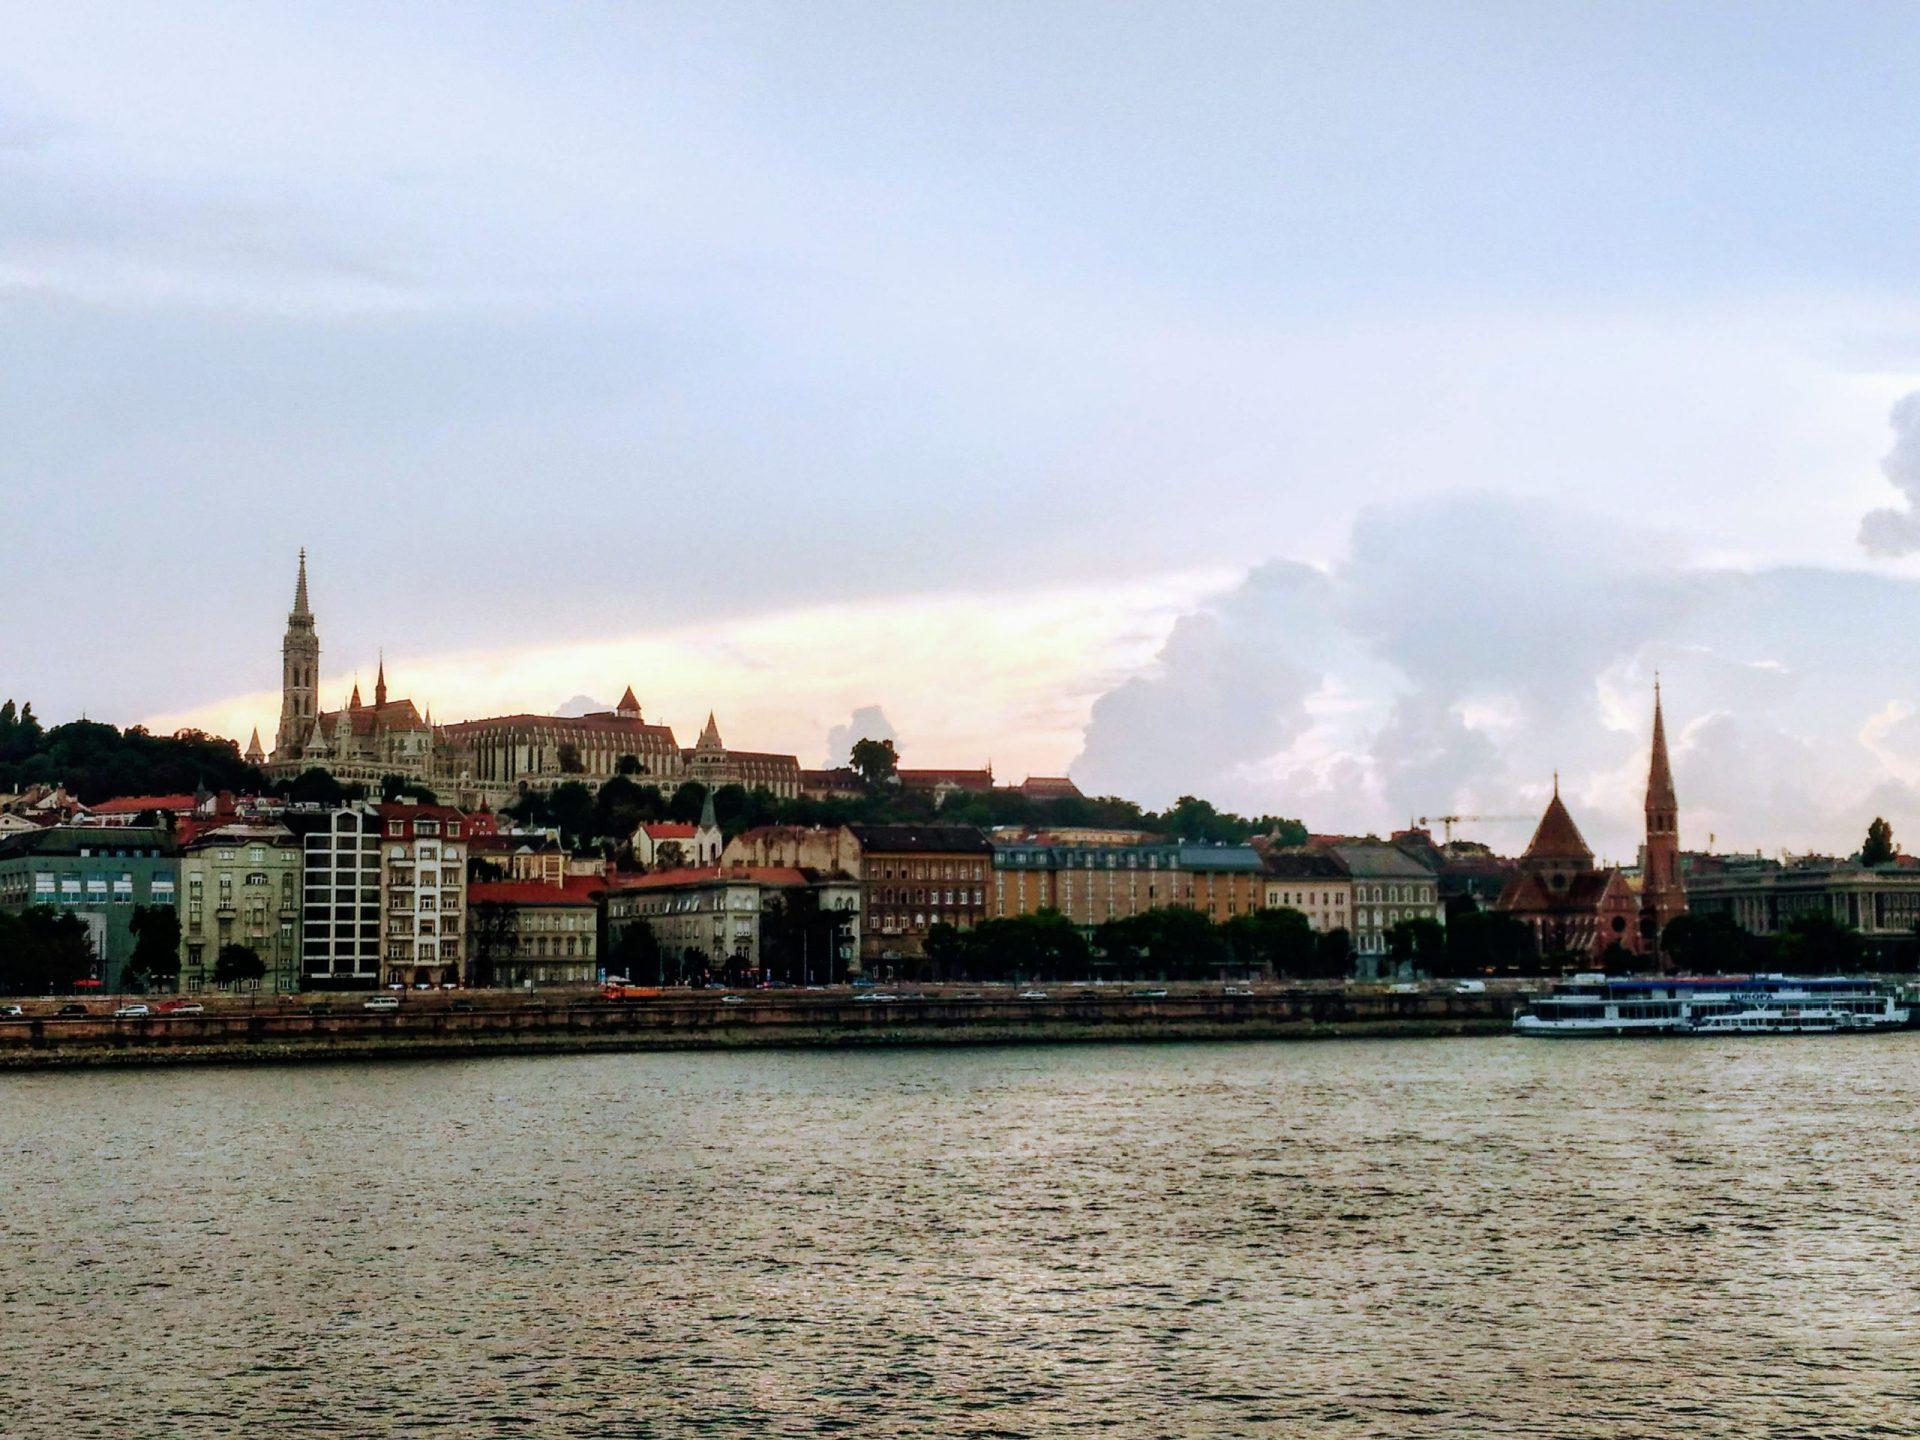 Рыбацкий бастион, Будапешт, Венгрия. Август, 2018